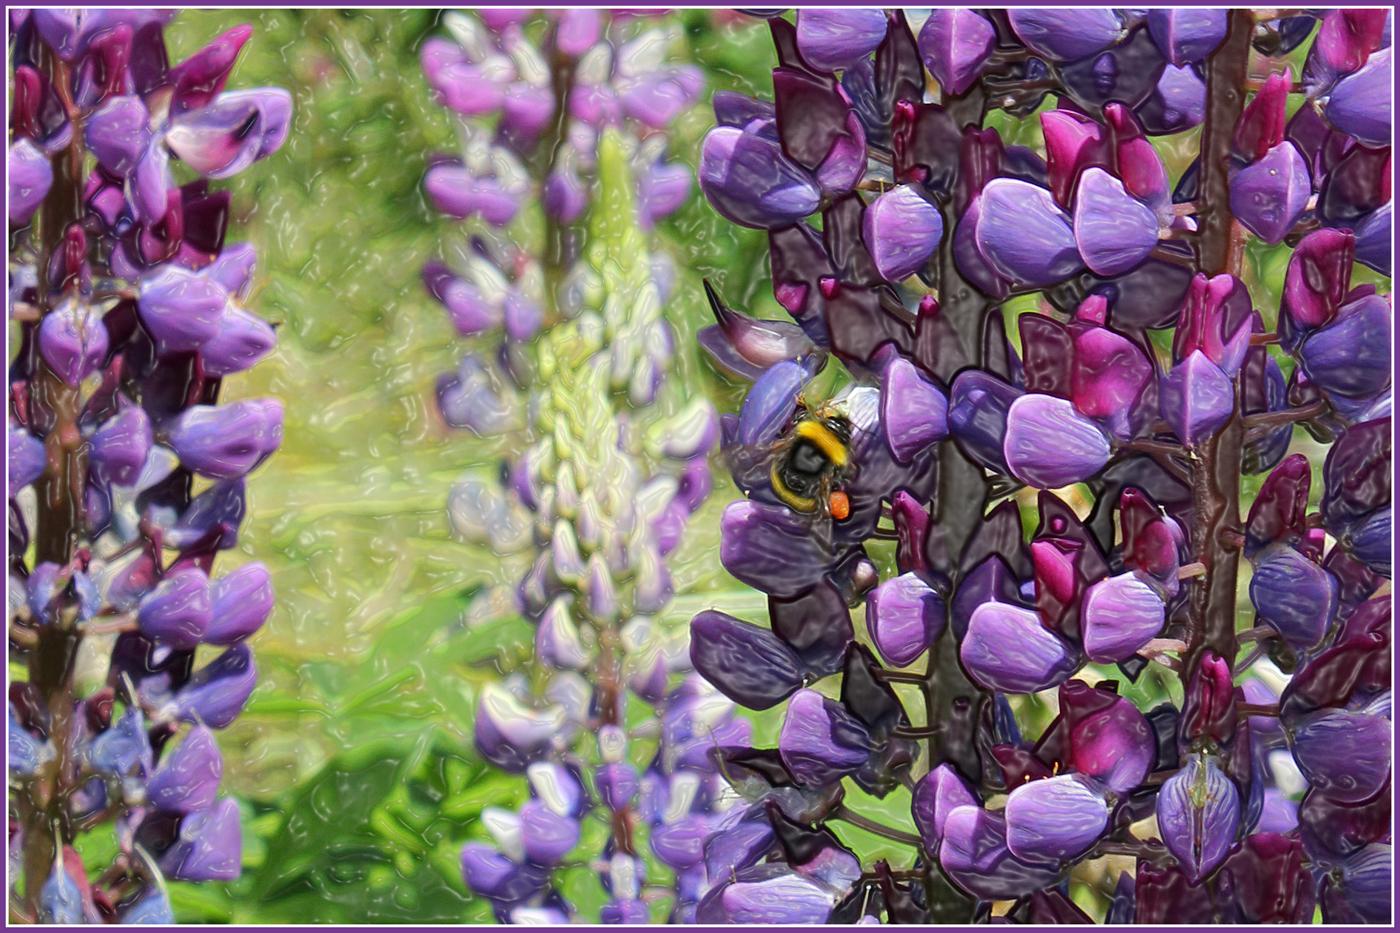 roberta houston - Bee Collecting Pollen